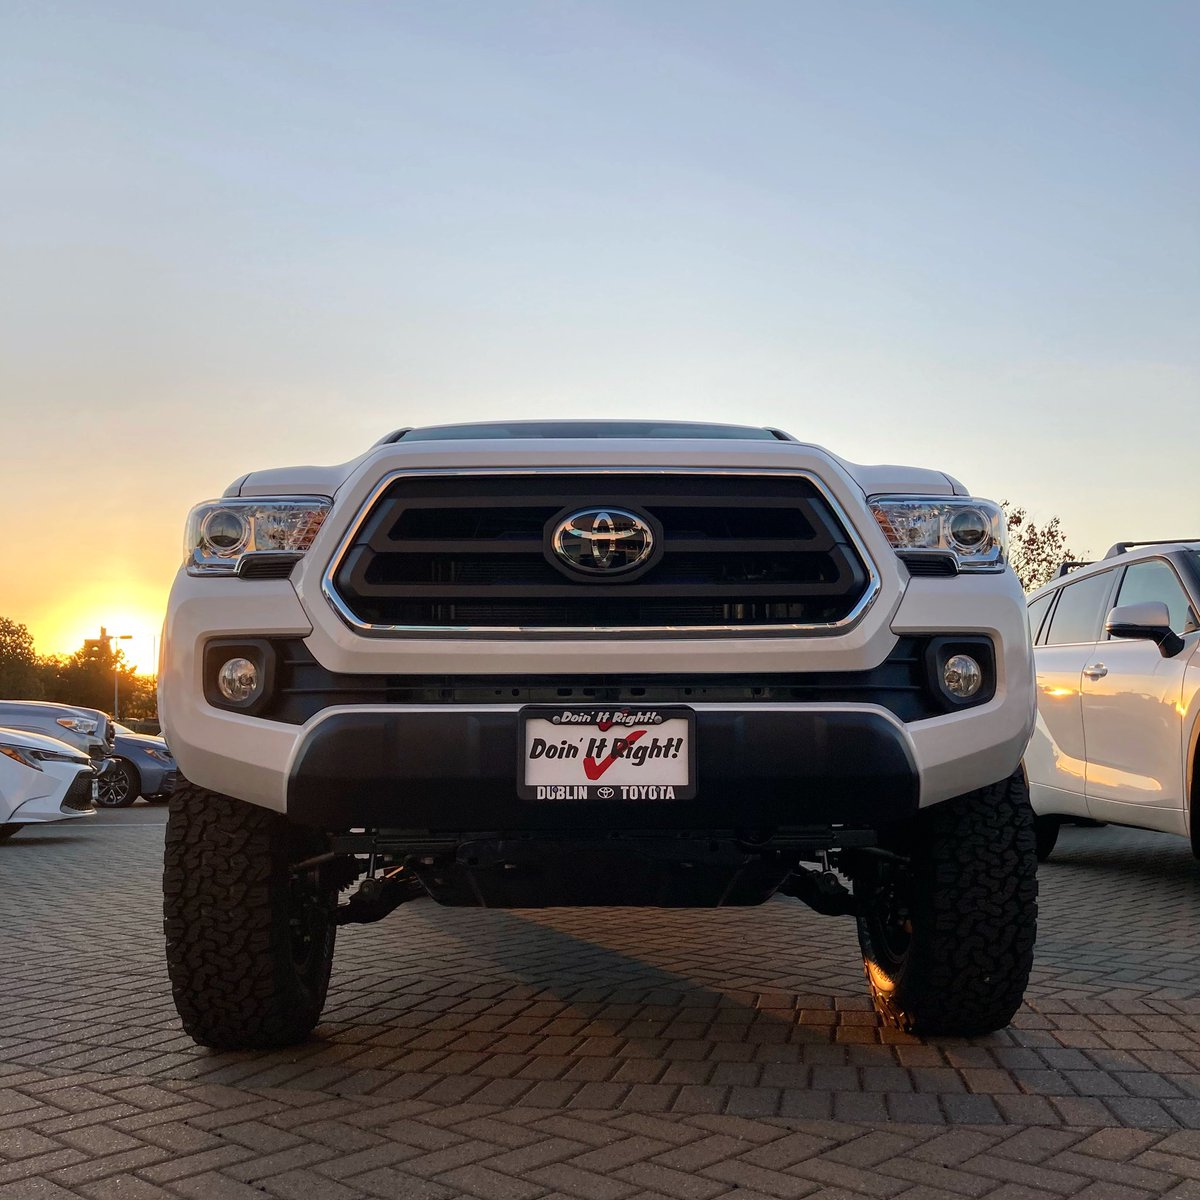 Need a LIFT? ⬆️🆙 2021 #Toyota #Tacoma https://t.co/VZukRm2ogG